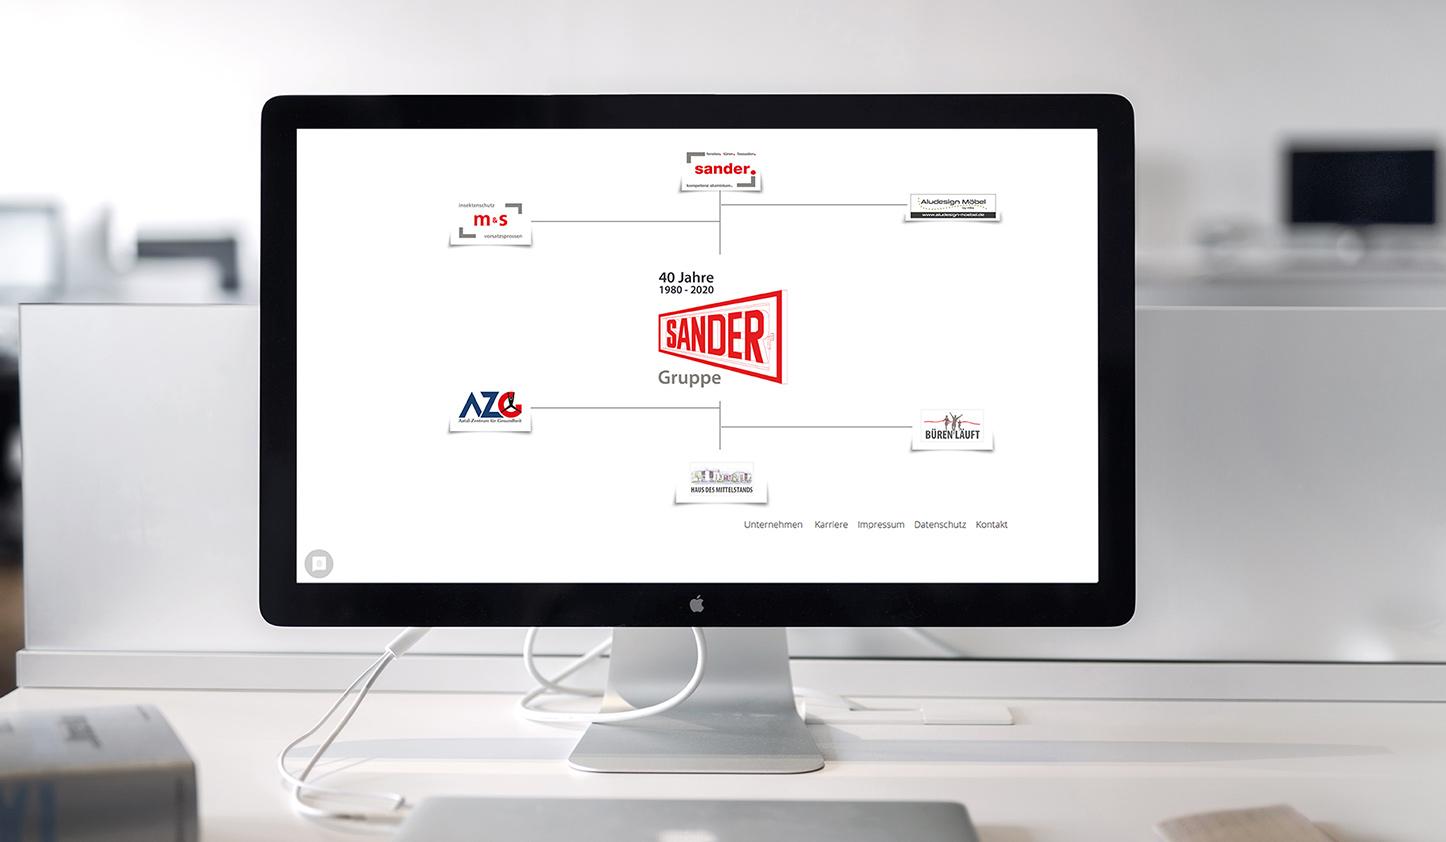 Referenz Webagentur Projectpartner Büren - Webdesing-Webentwicklung - Webprojekte